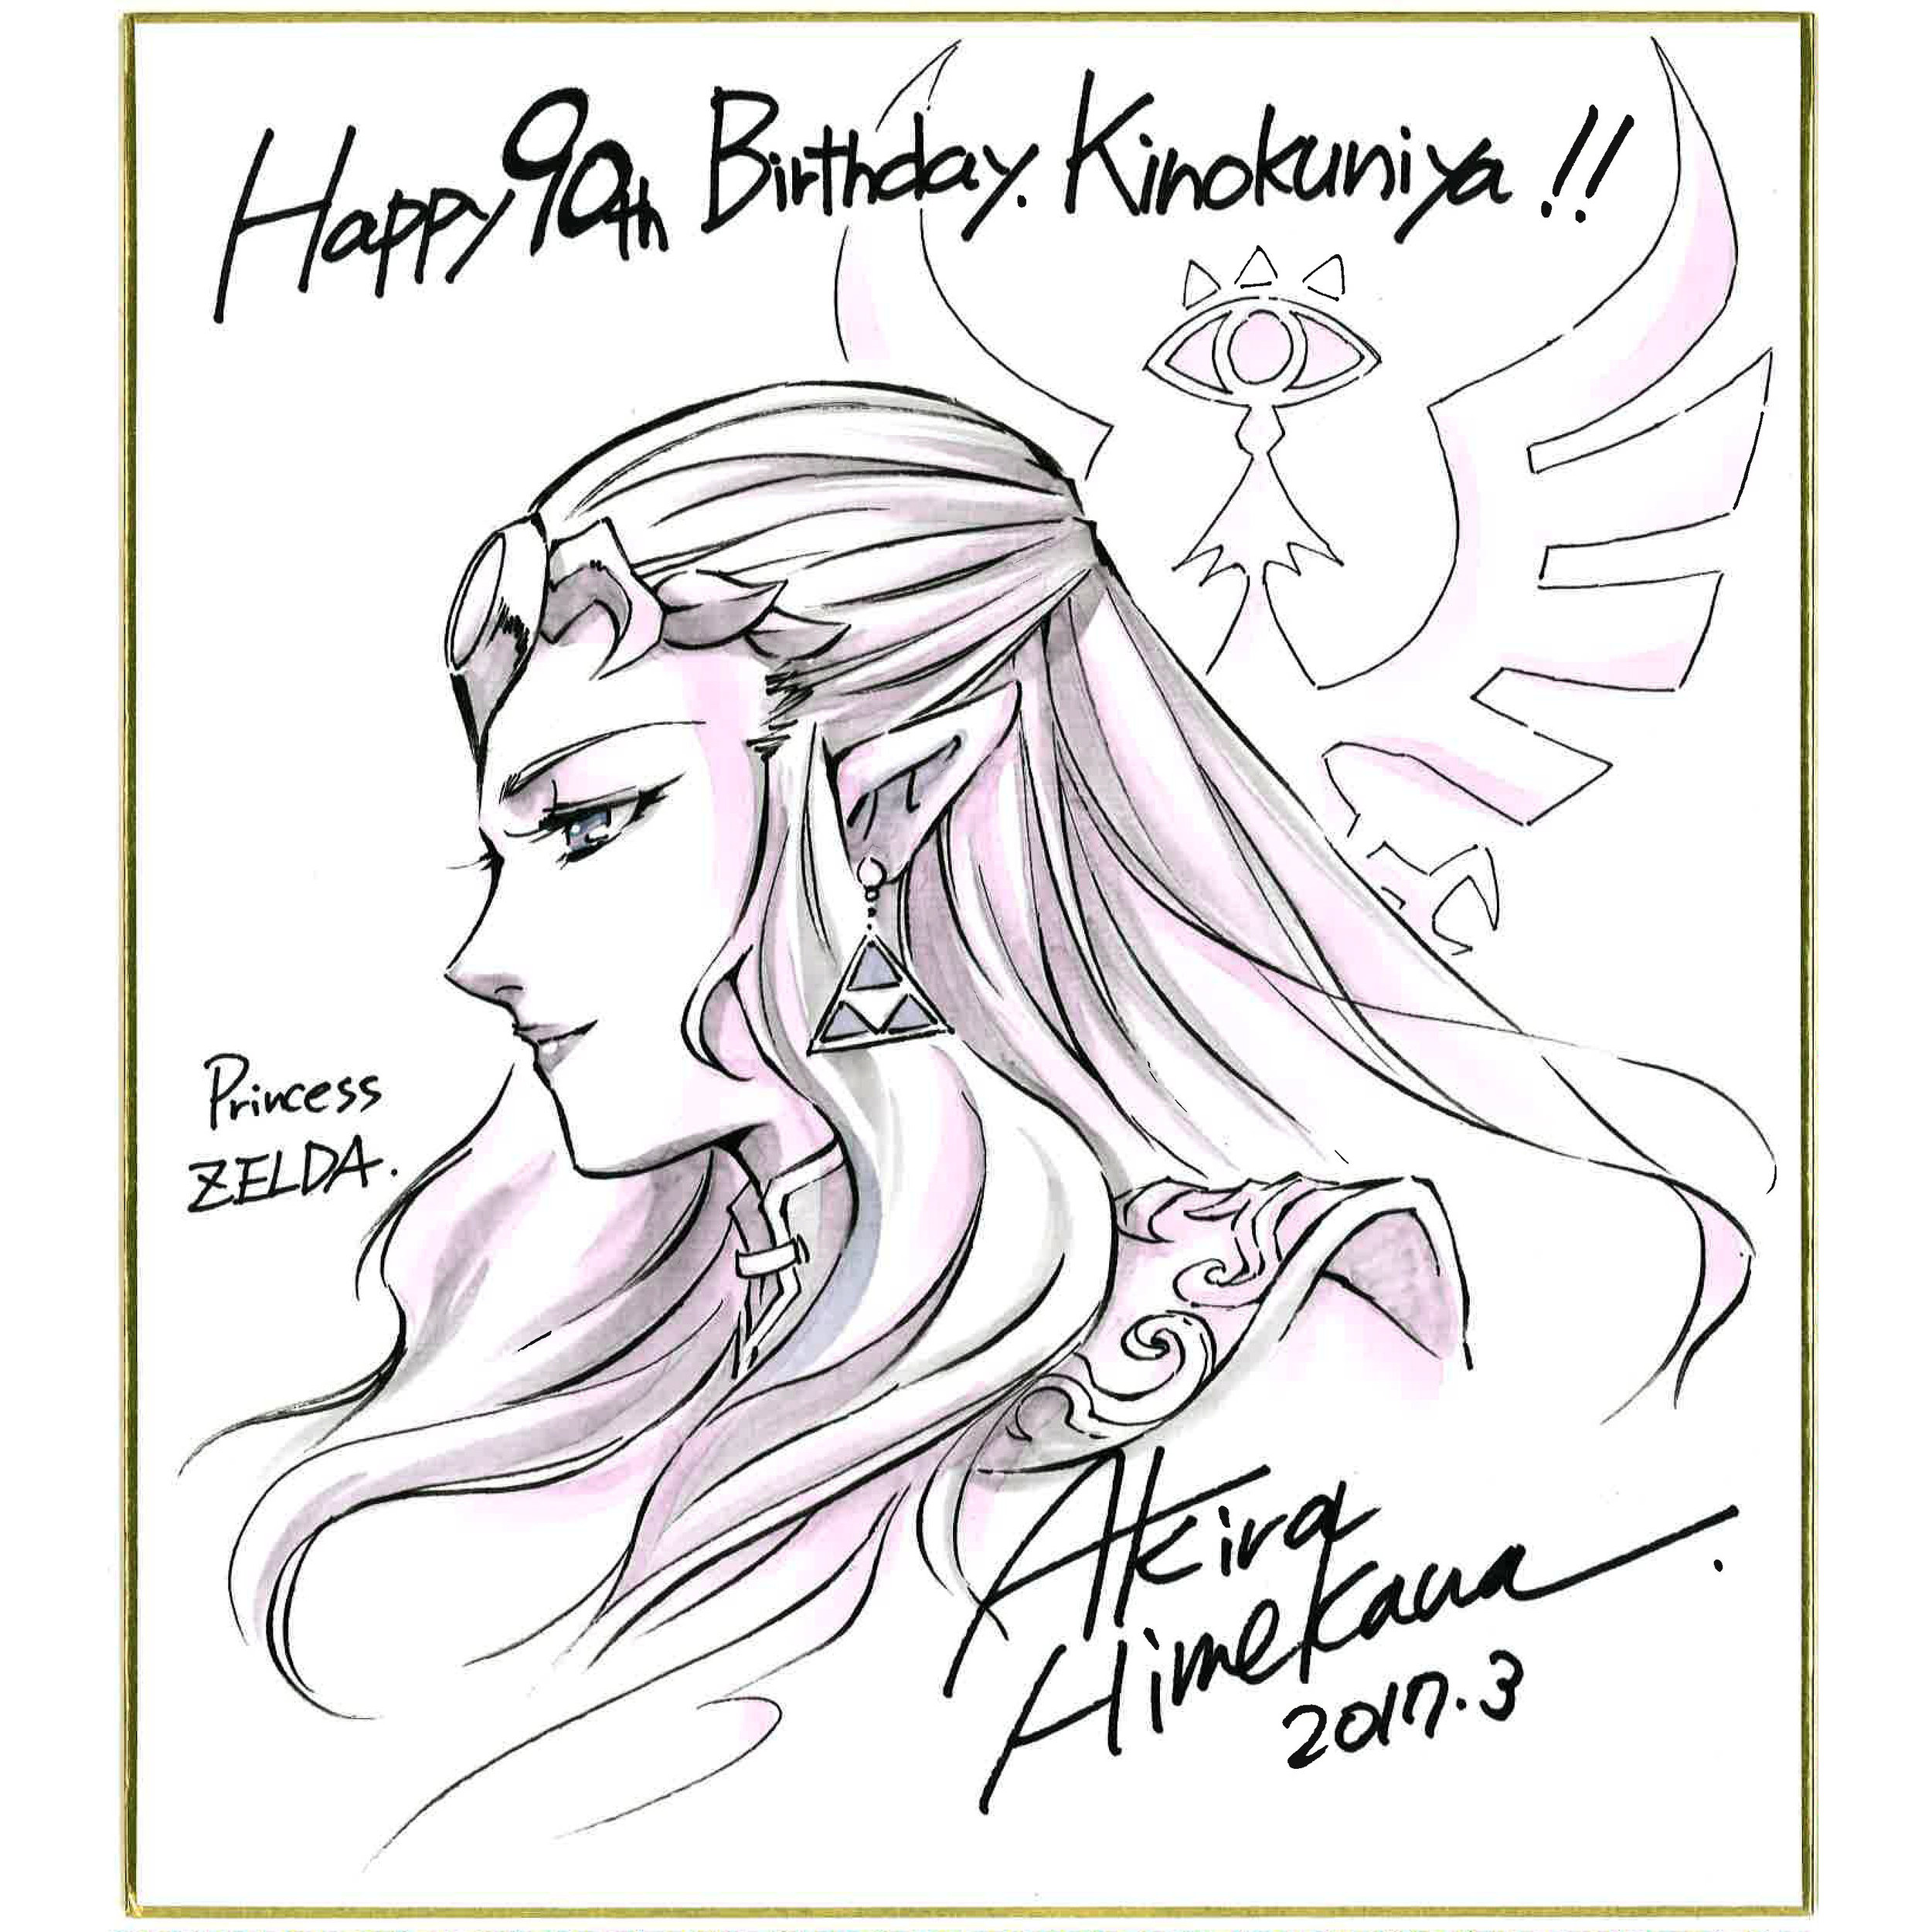 Akira Himekawa: The Legend of Zelda: Twilight Princess